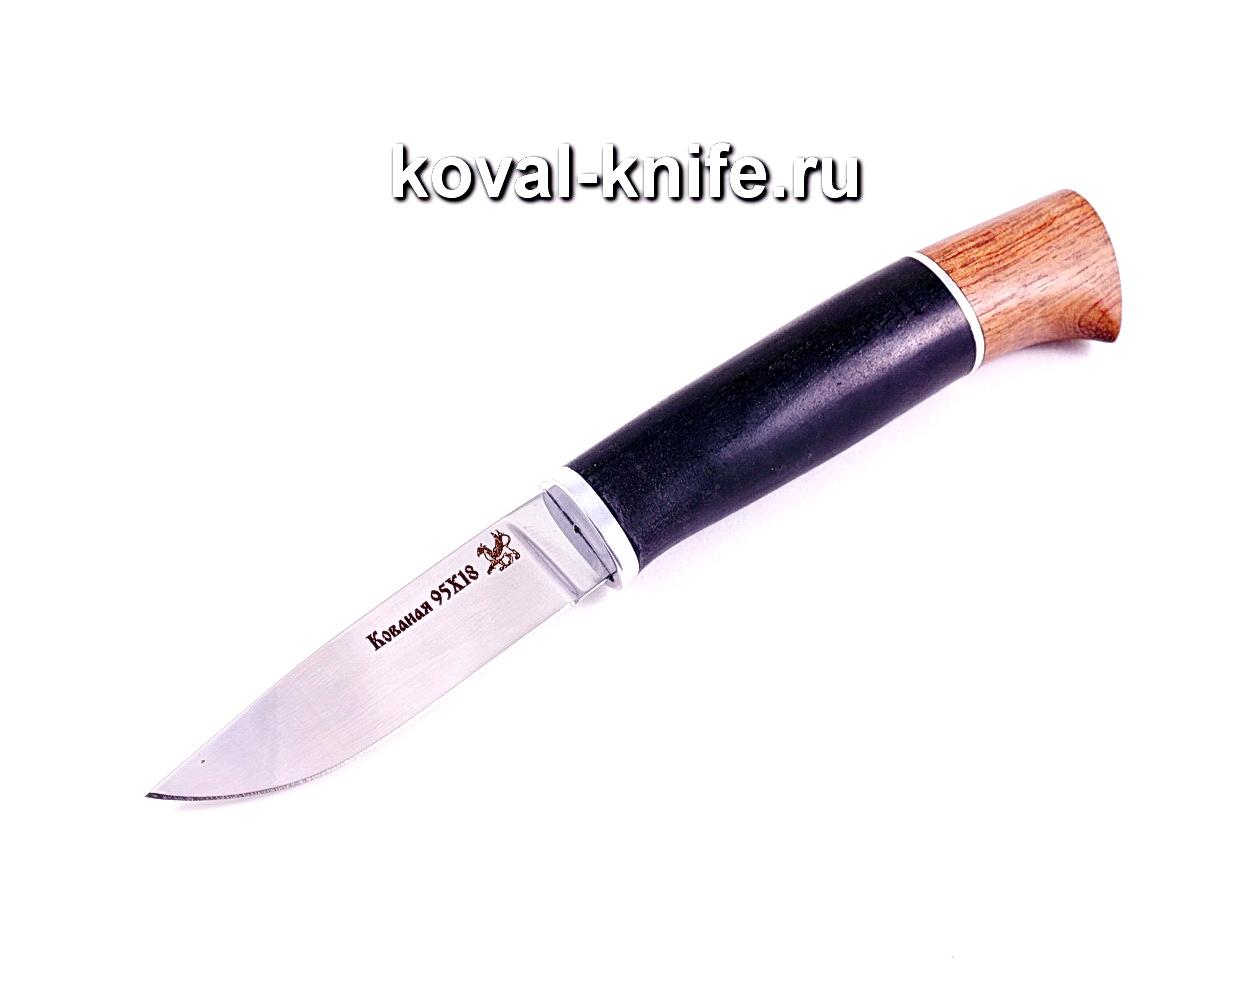 Нож Грибник (сталь 95х18), рукоять граб, бубинга A006